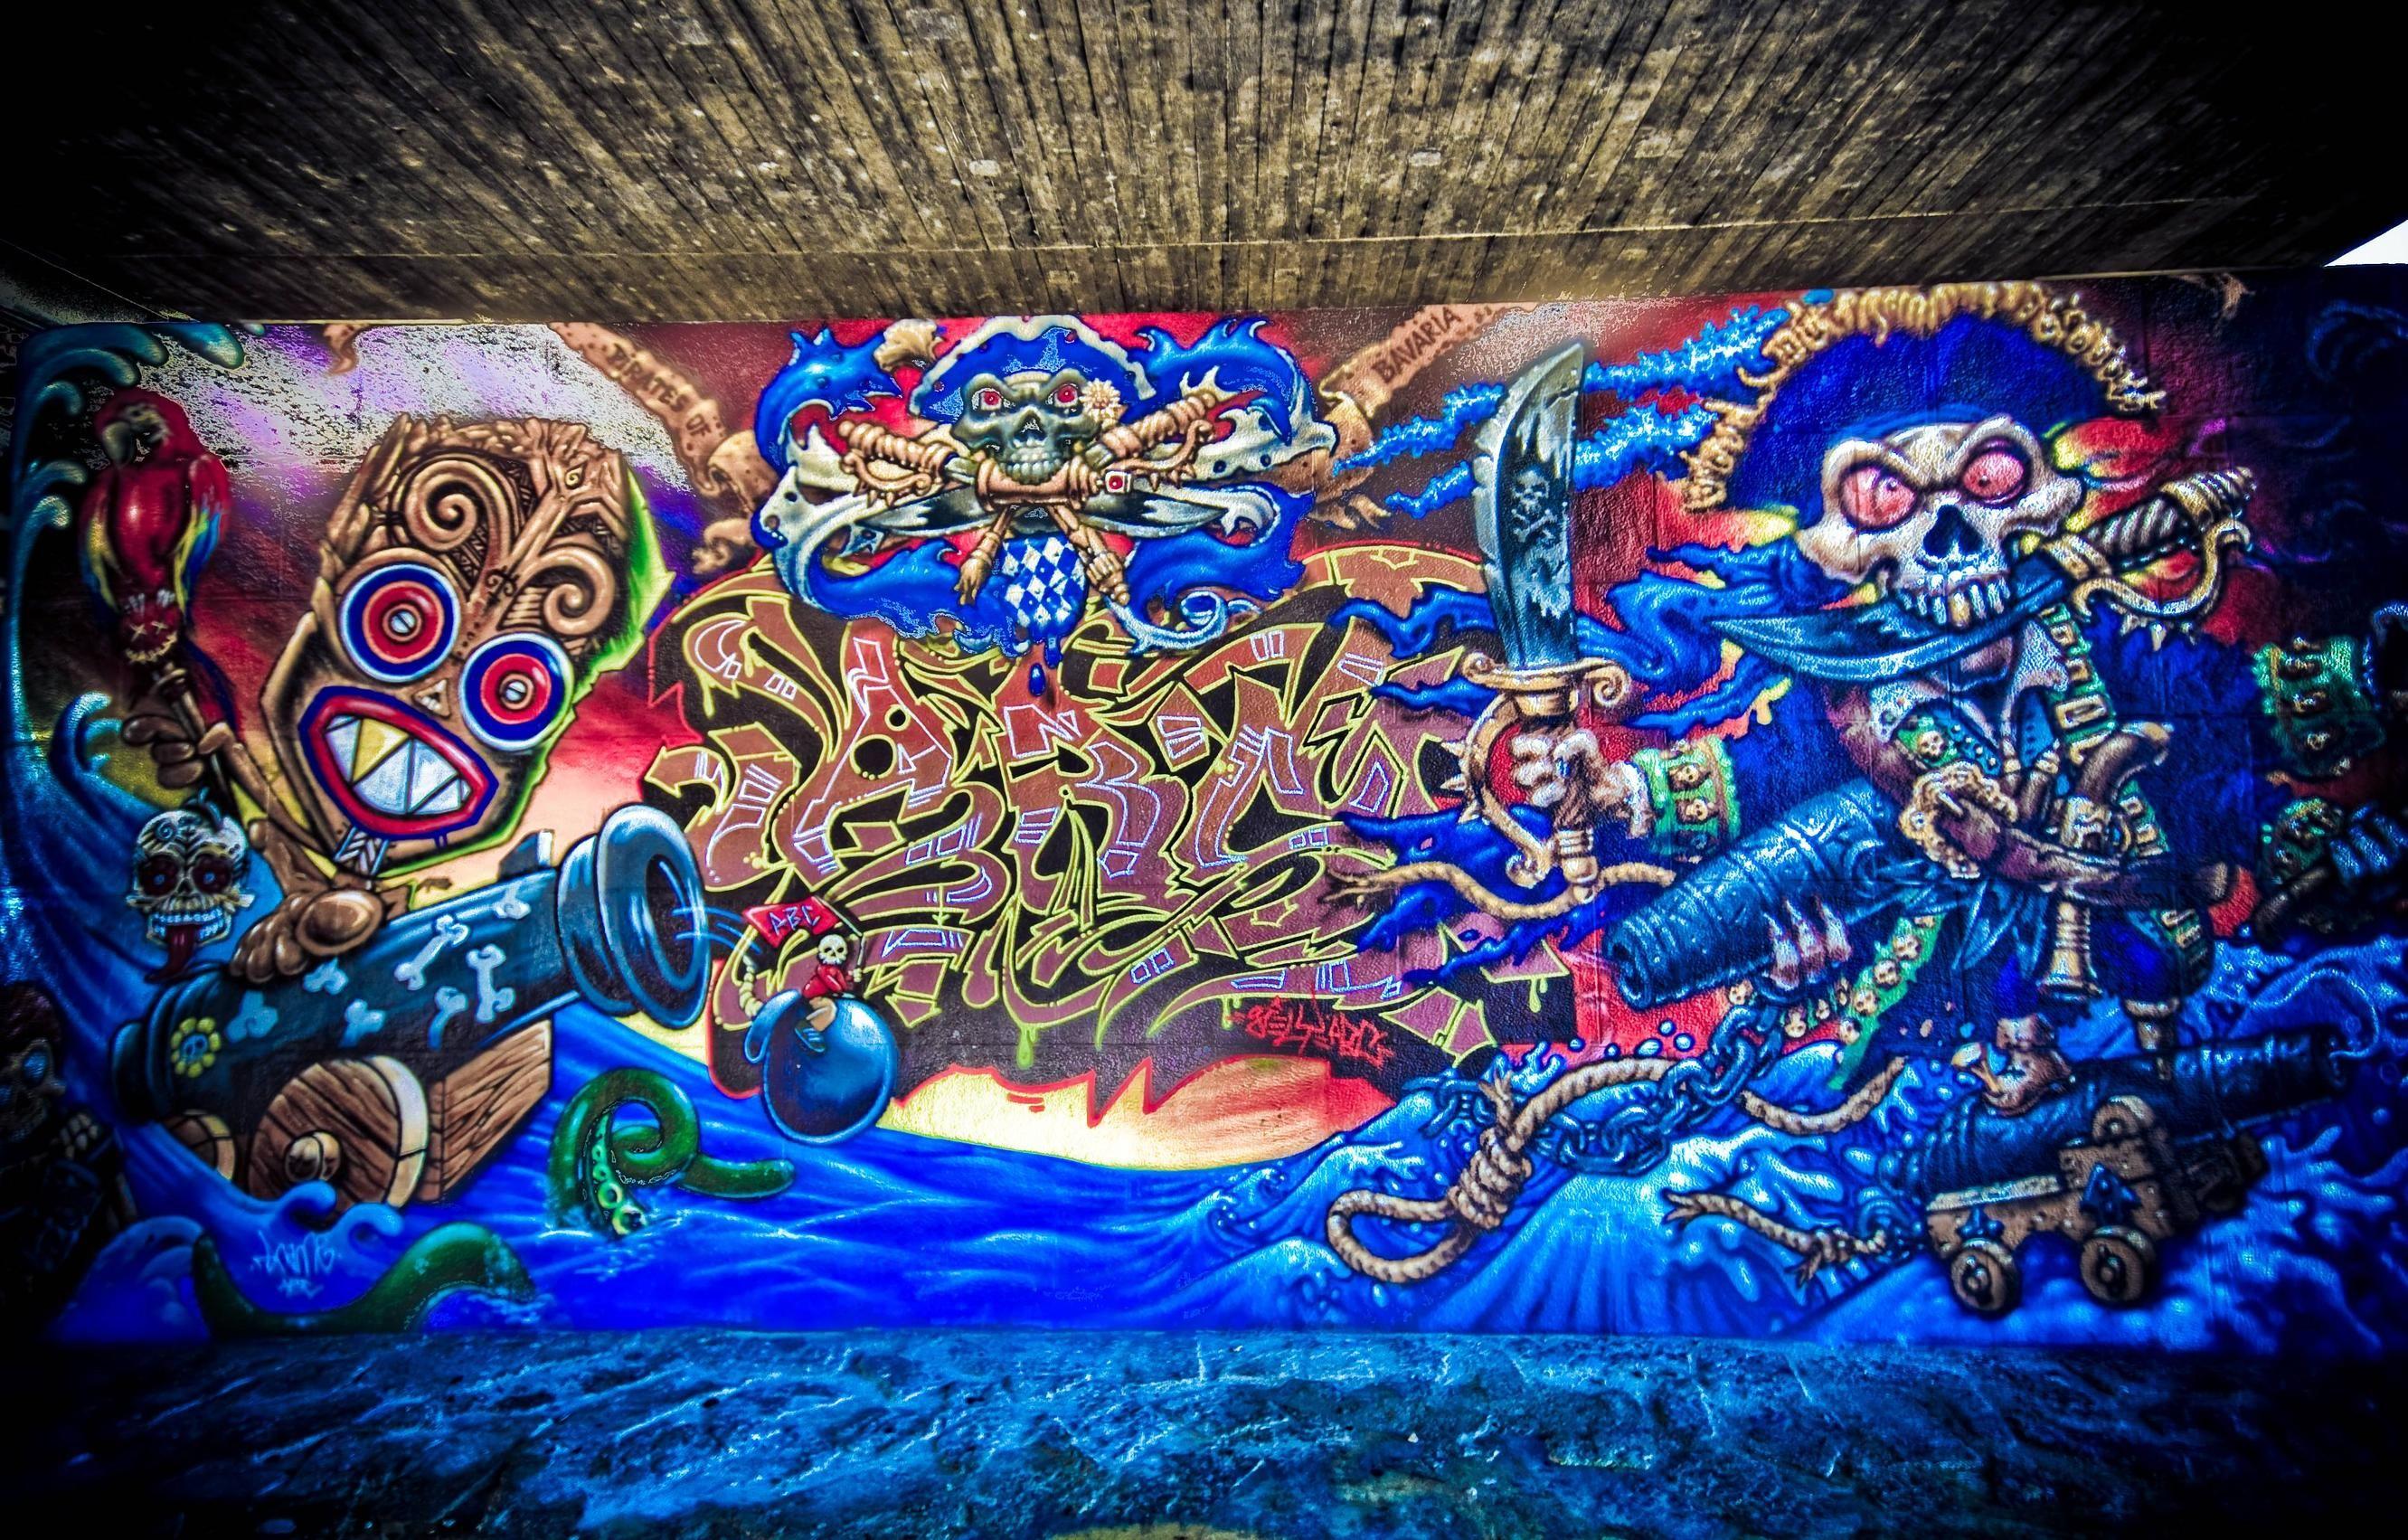 Graffiti art wallpaper iphone - Graffiti Wallpaper Artistic Hd Background Amazing